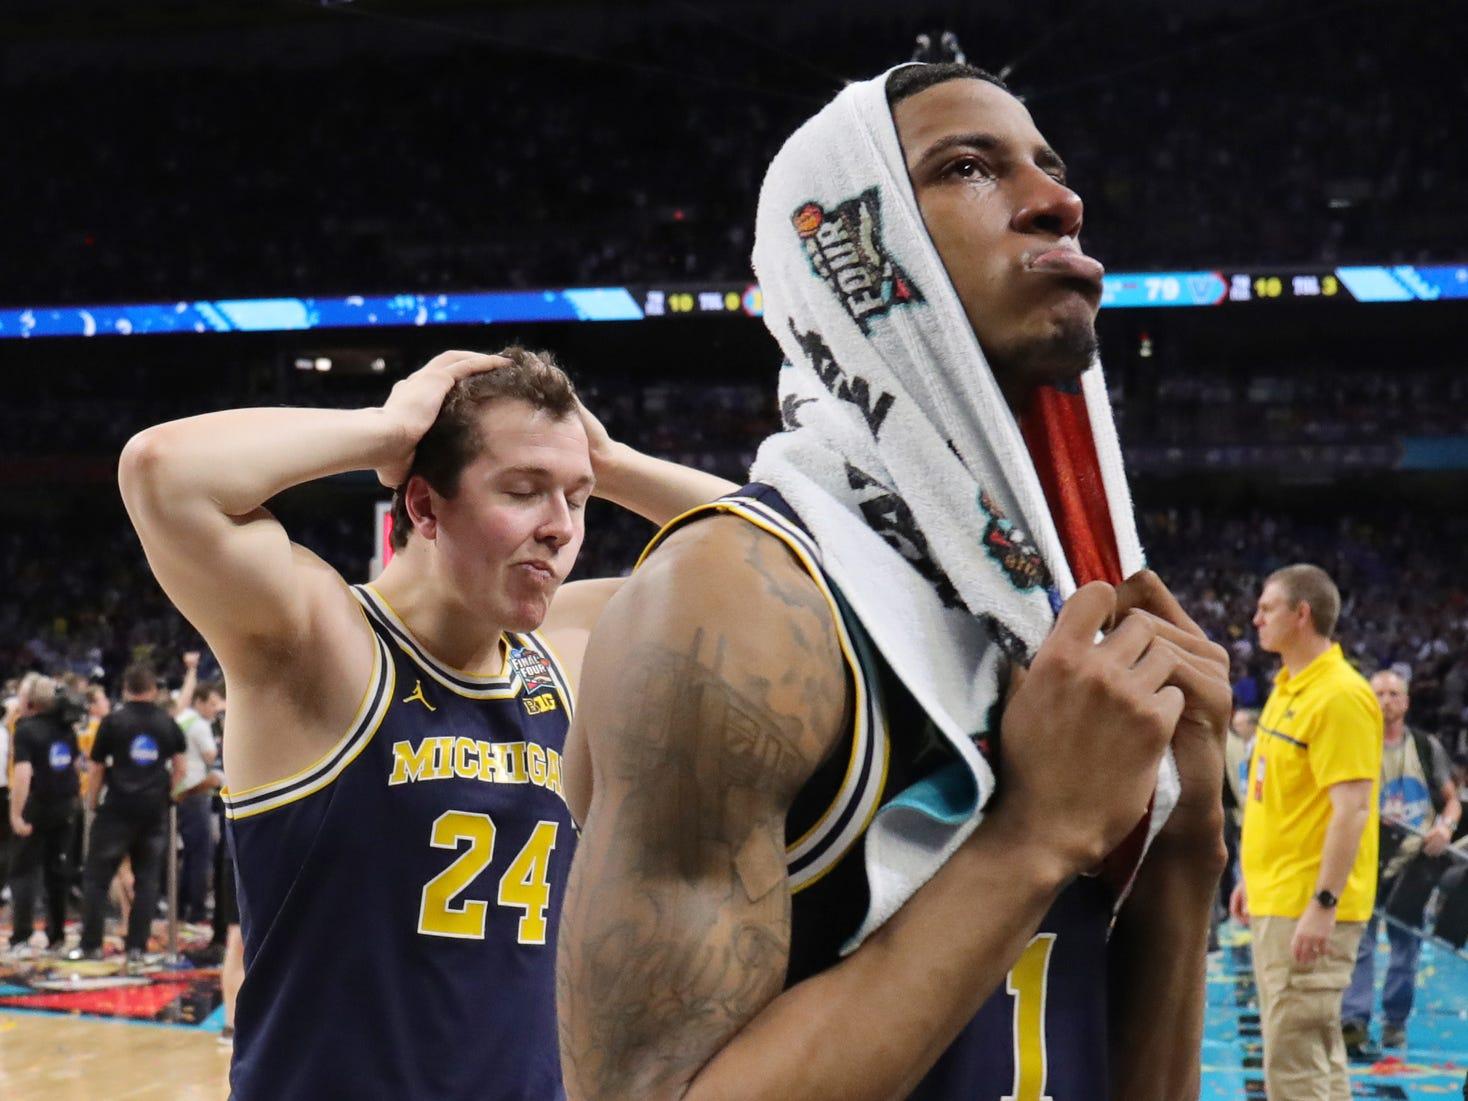 Michigan guard Charles Matthews (1) and forward C.J. Baird (24) leave the floor after losing 79-62 during the NCAA division 1 men's basketball national championship game between Michigan and Villanova on Monday, April 2, 2018, at the Alamodome in San Antonio.